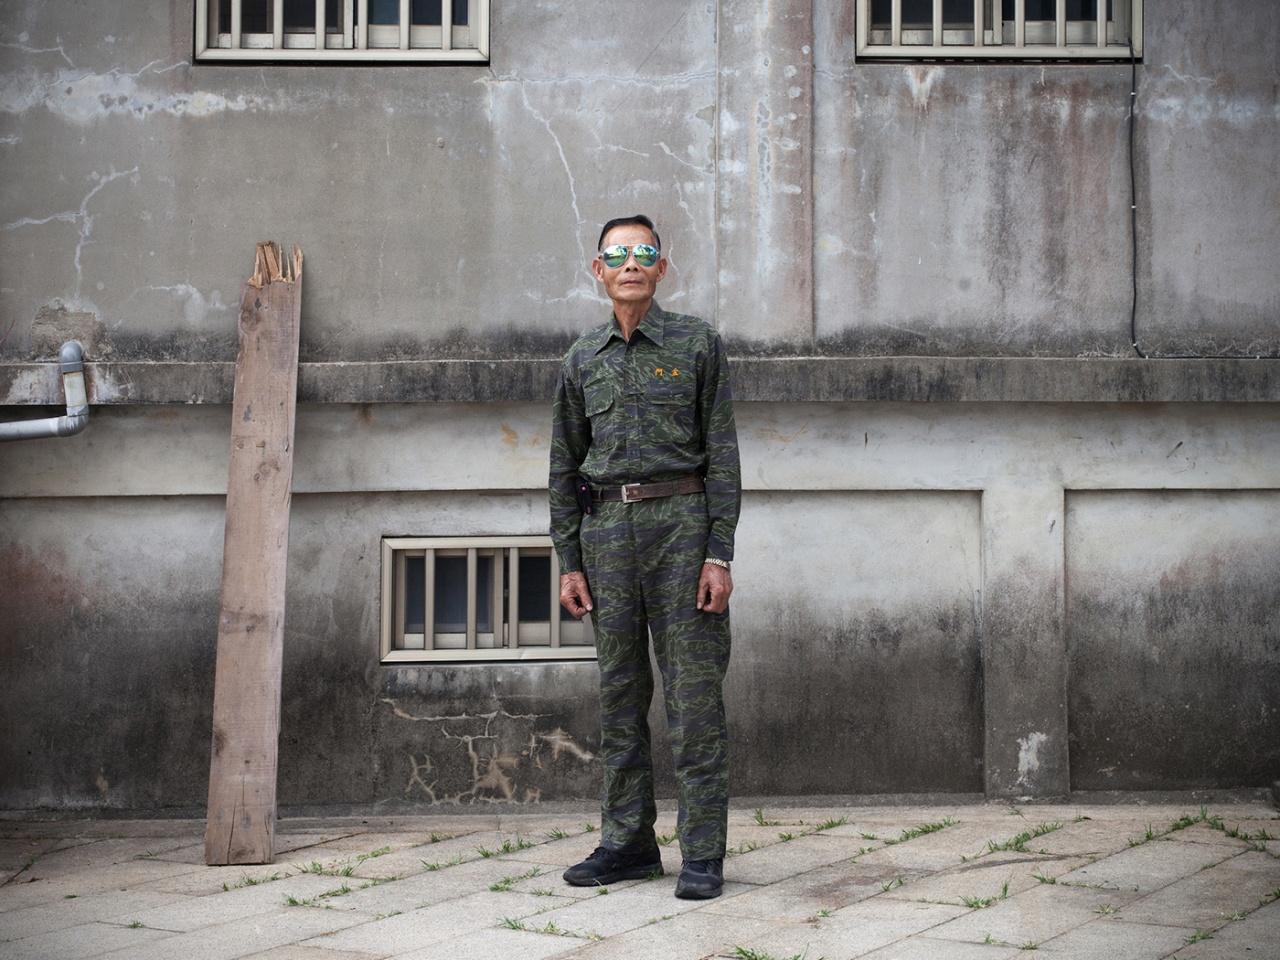 Kinmen - The Iron Curtain of China